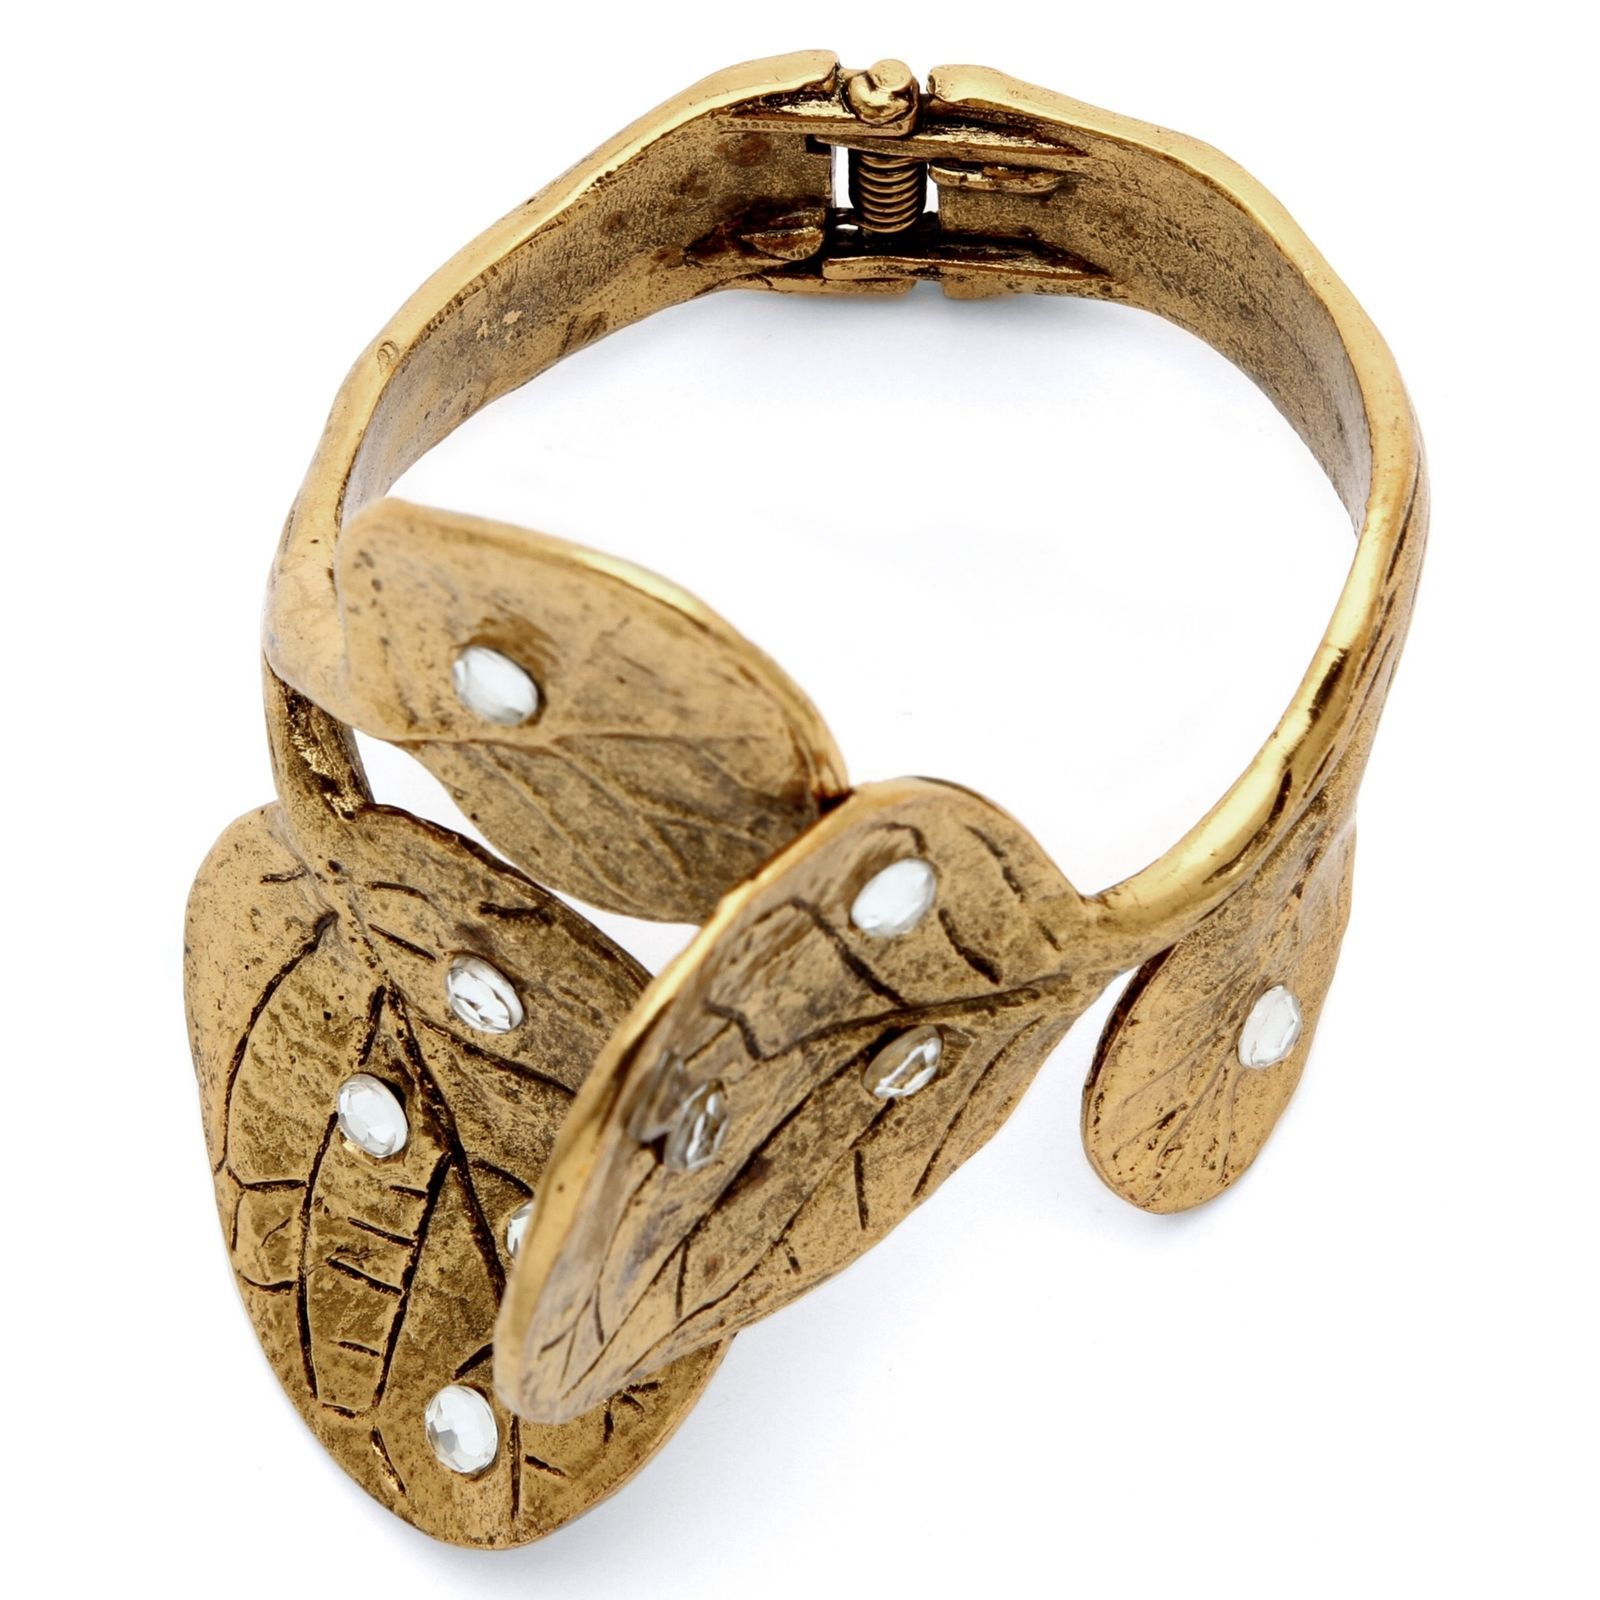 PalmBeach Jewelry Crystal 14k Yellow Gold-Plated Leaf Bangle Bracelet